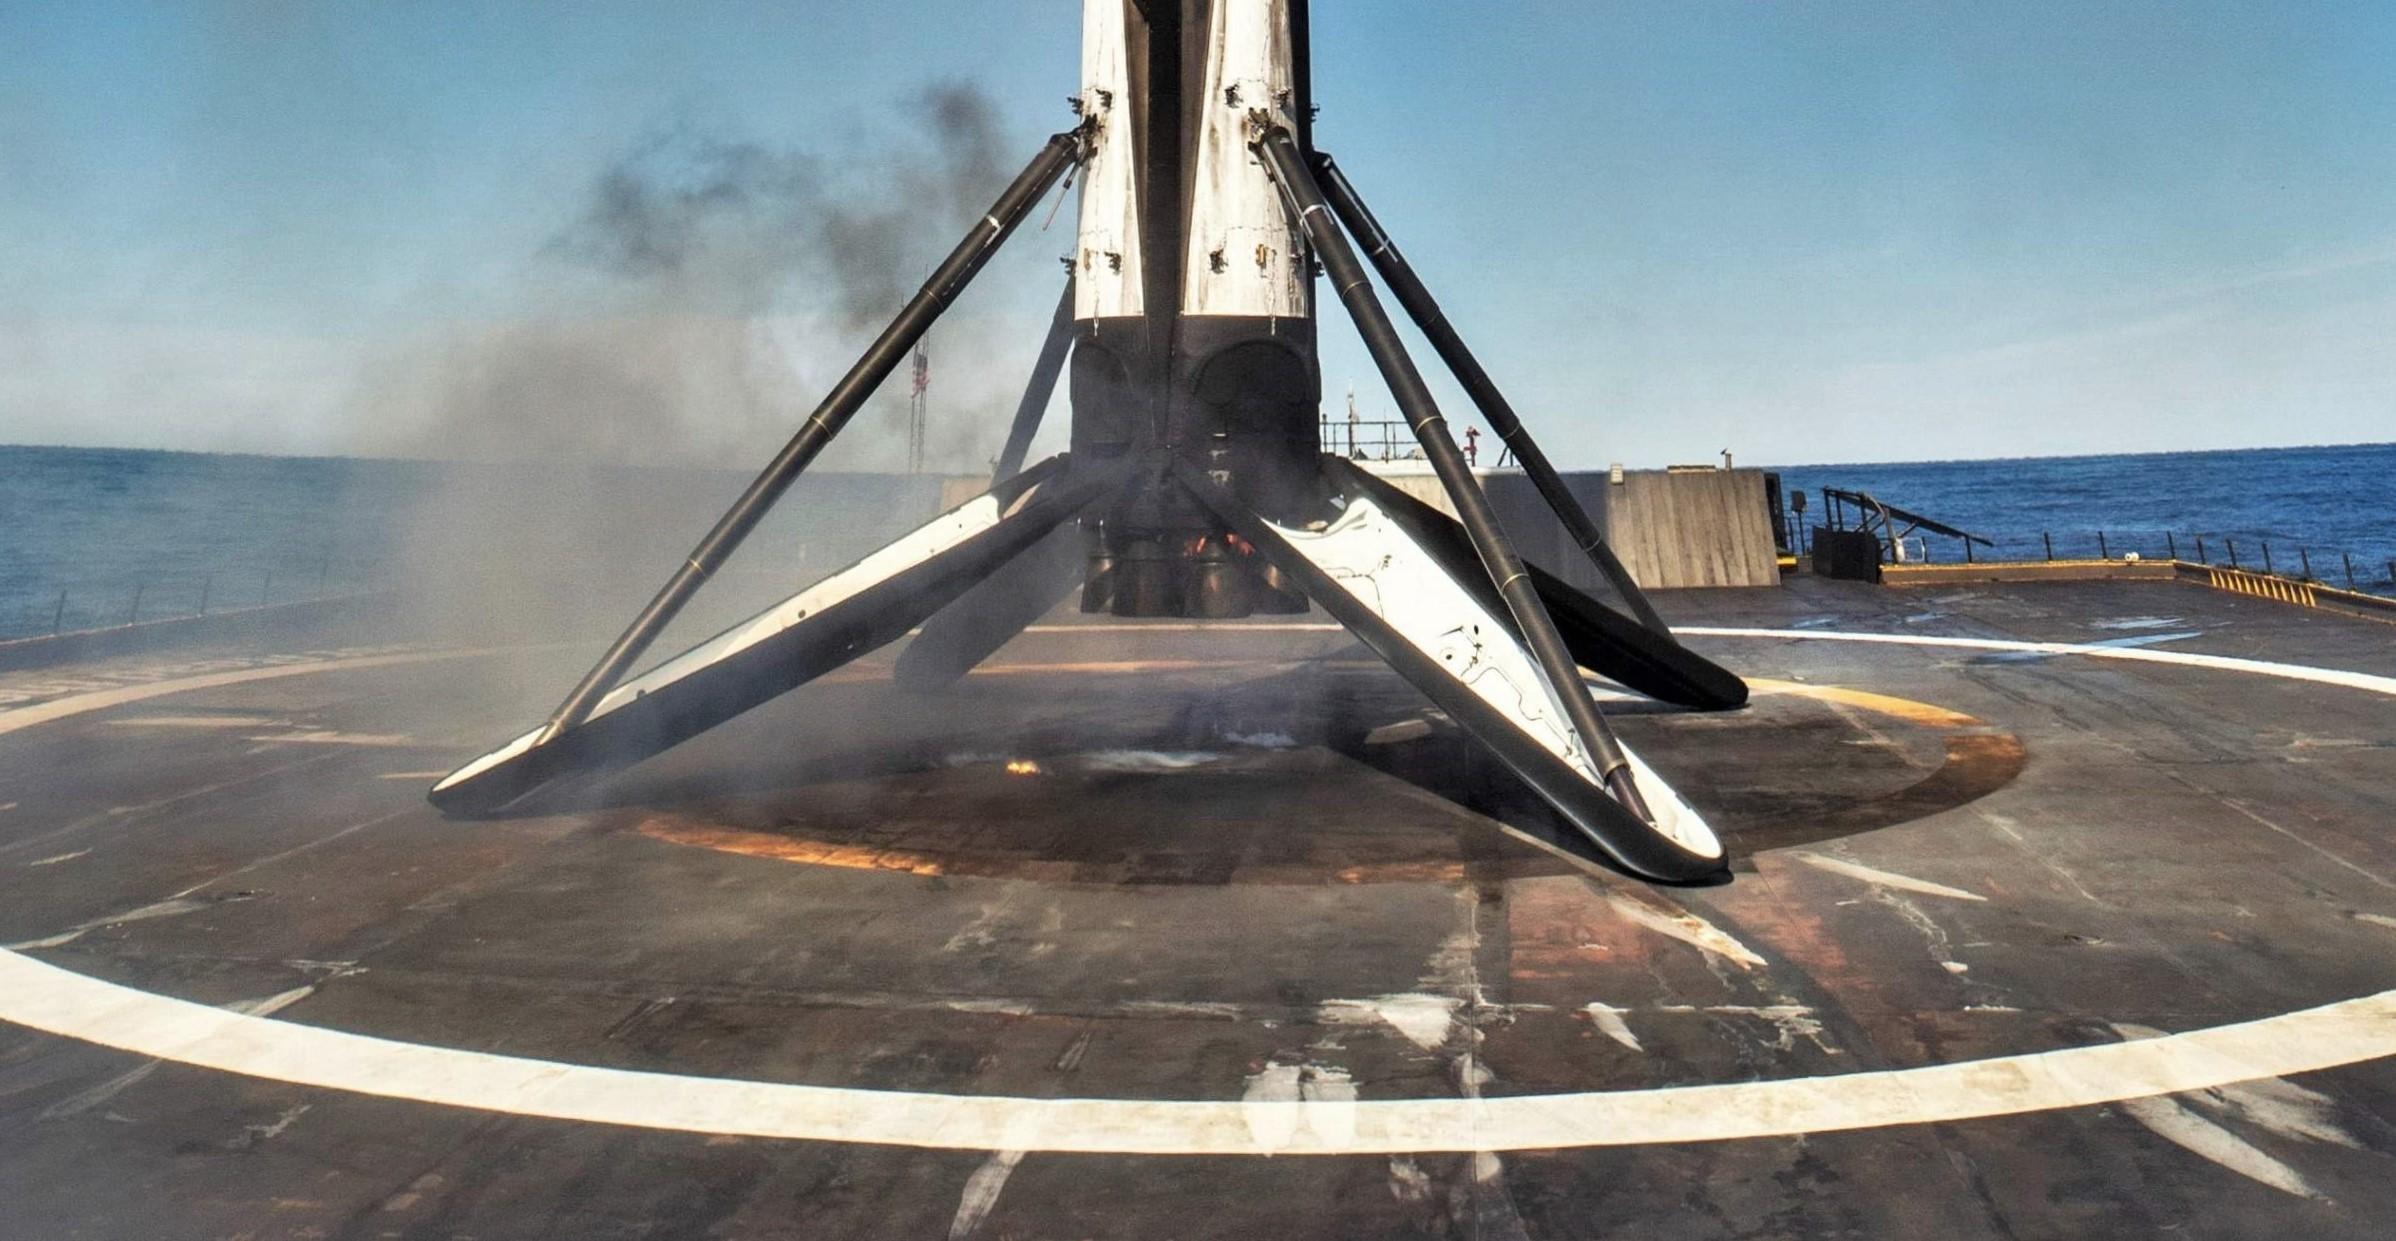 Falcon 9 B1046 SSO-A third landing (SpaceX) 3 edit crop